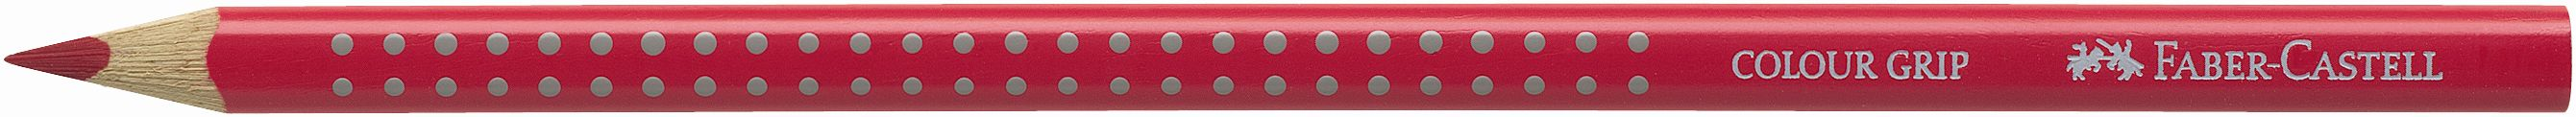 Pastelka Color Grip / 126 permanentní karmín Faber Castell - Akvarelové pastelky Faber Castell - Akvarelové pastelky